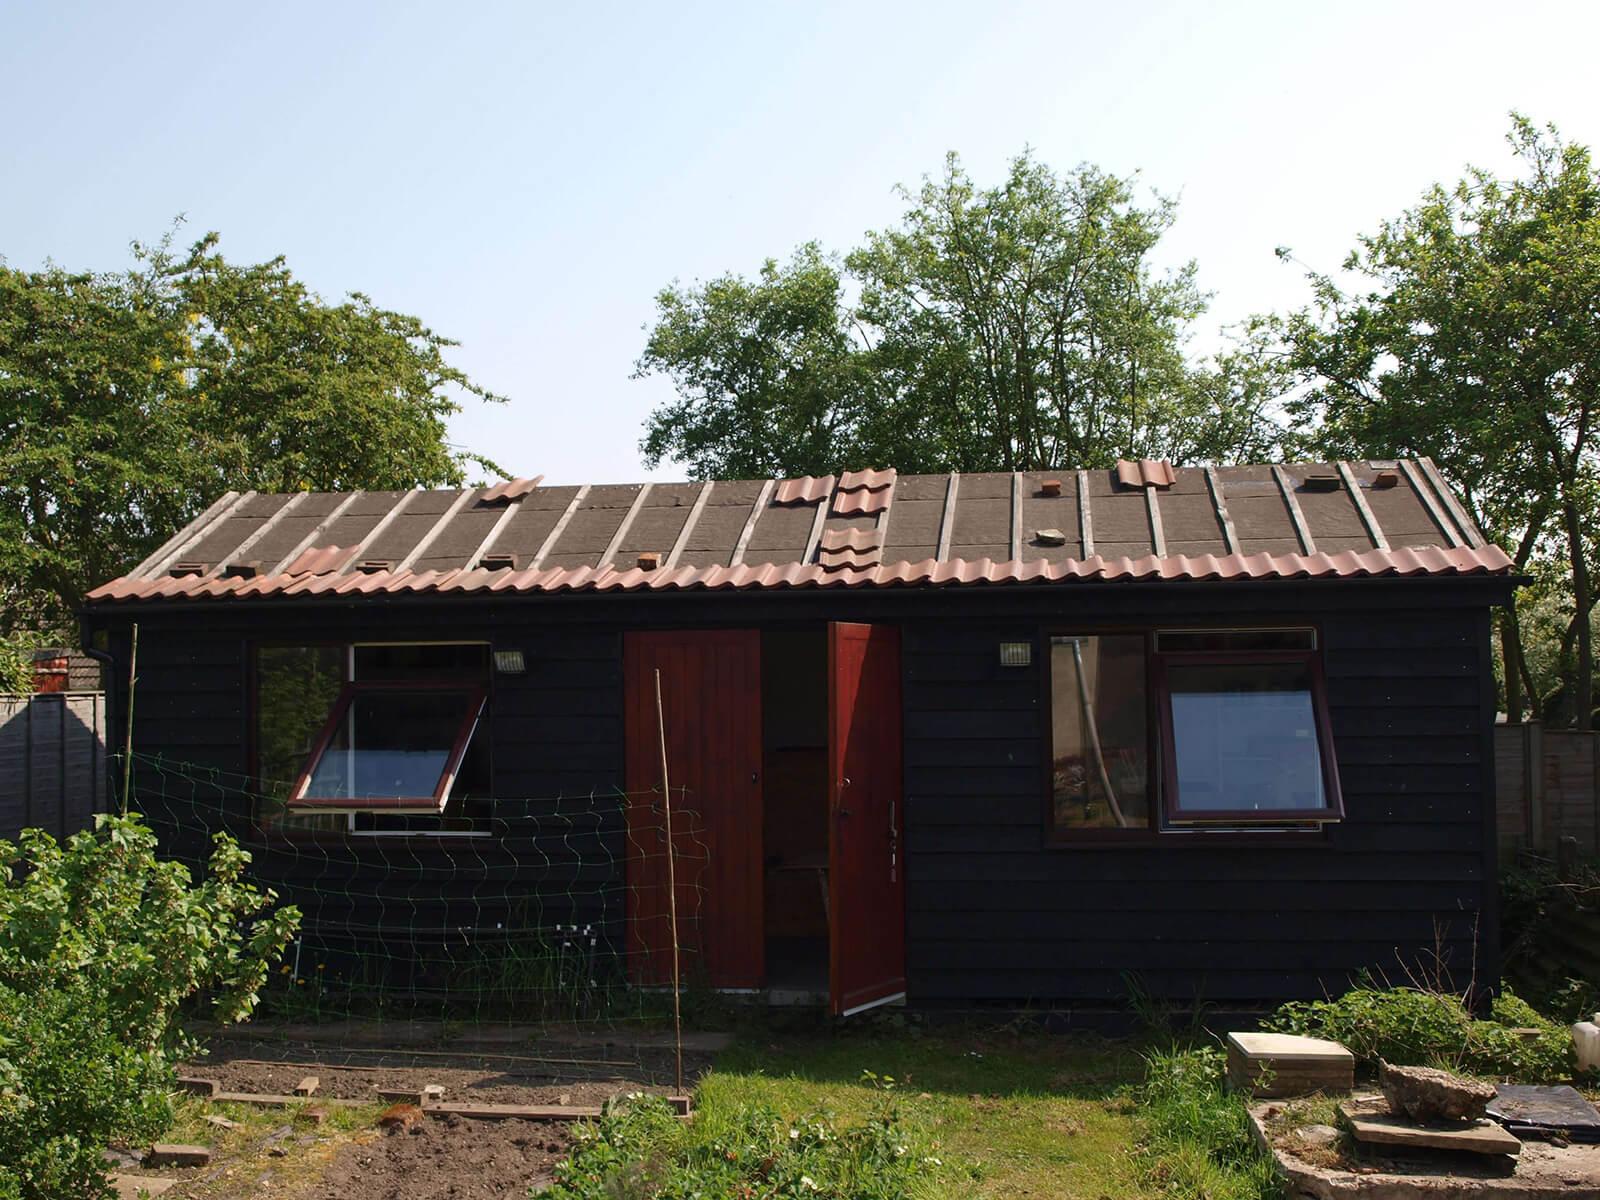 Copper Brown Tileform Sheeting on garden shed.